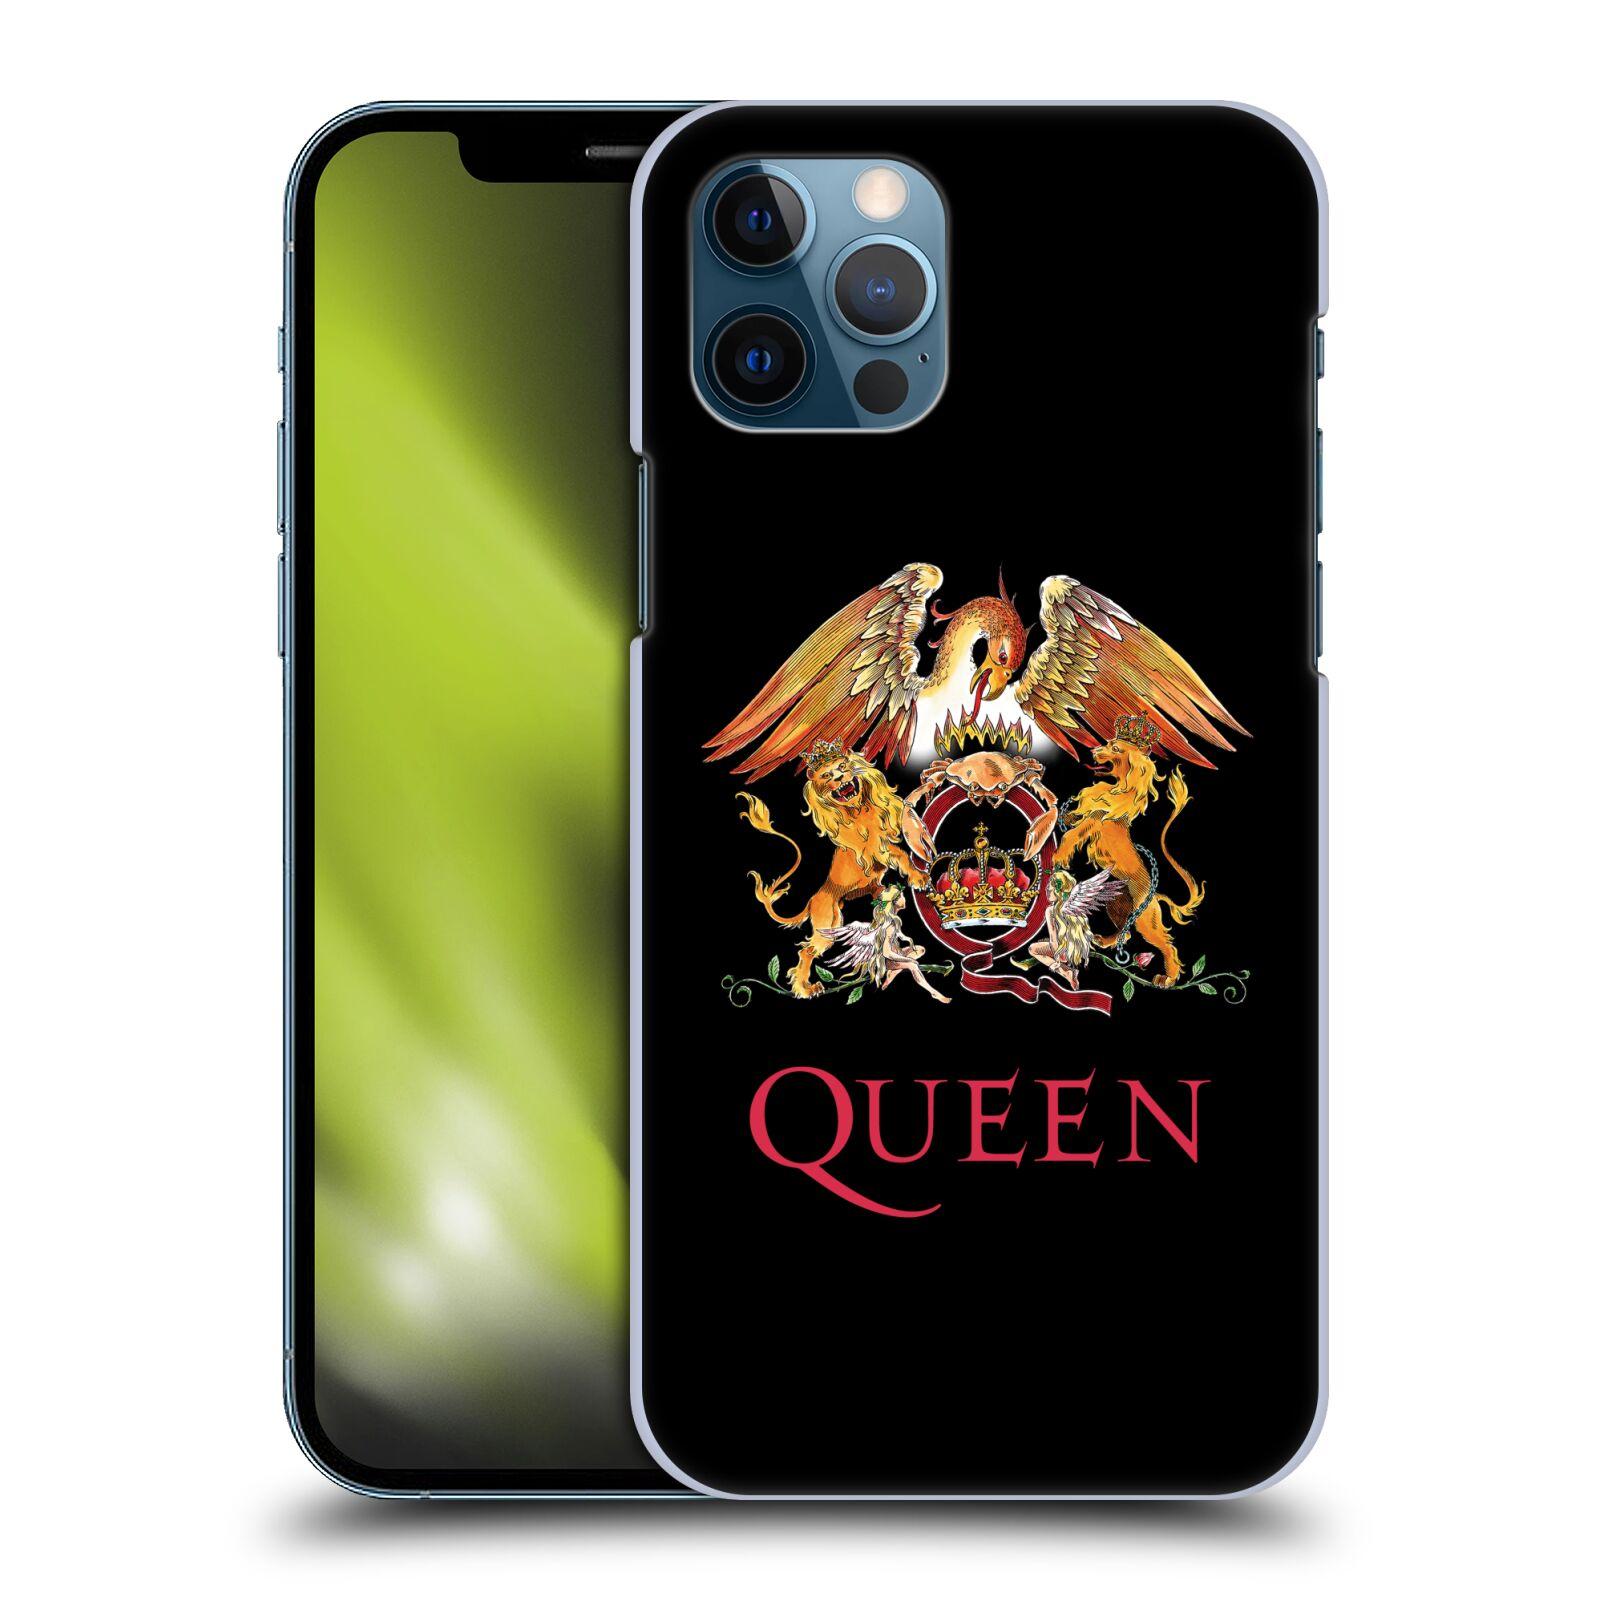 Plastové pouzdro na mobil Apple iPhone 12 / 12 Pro - Head Case - Queen - Logo